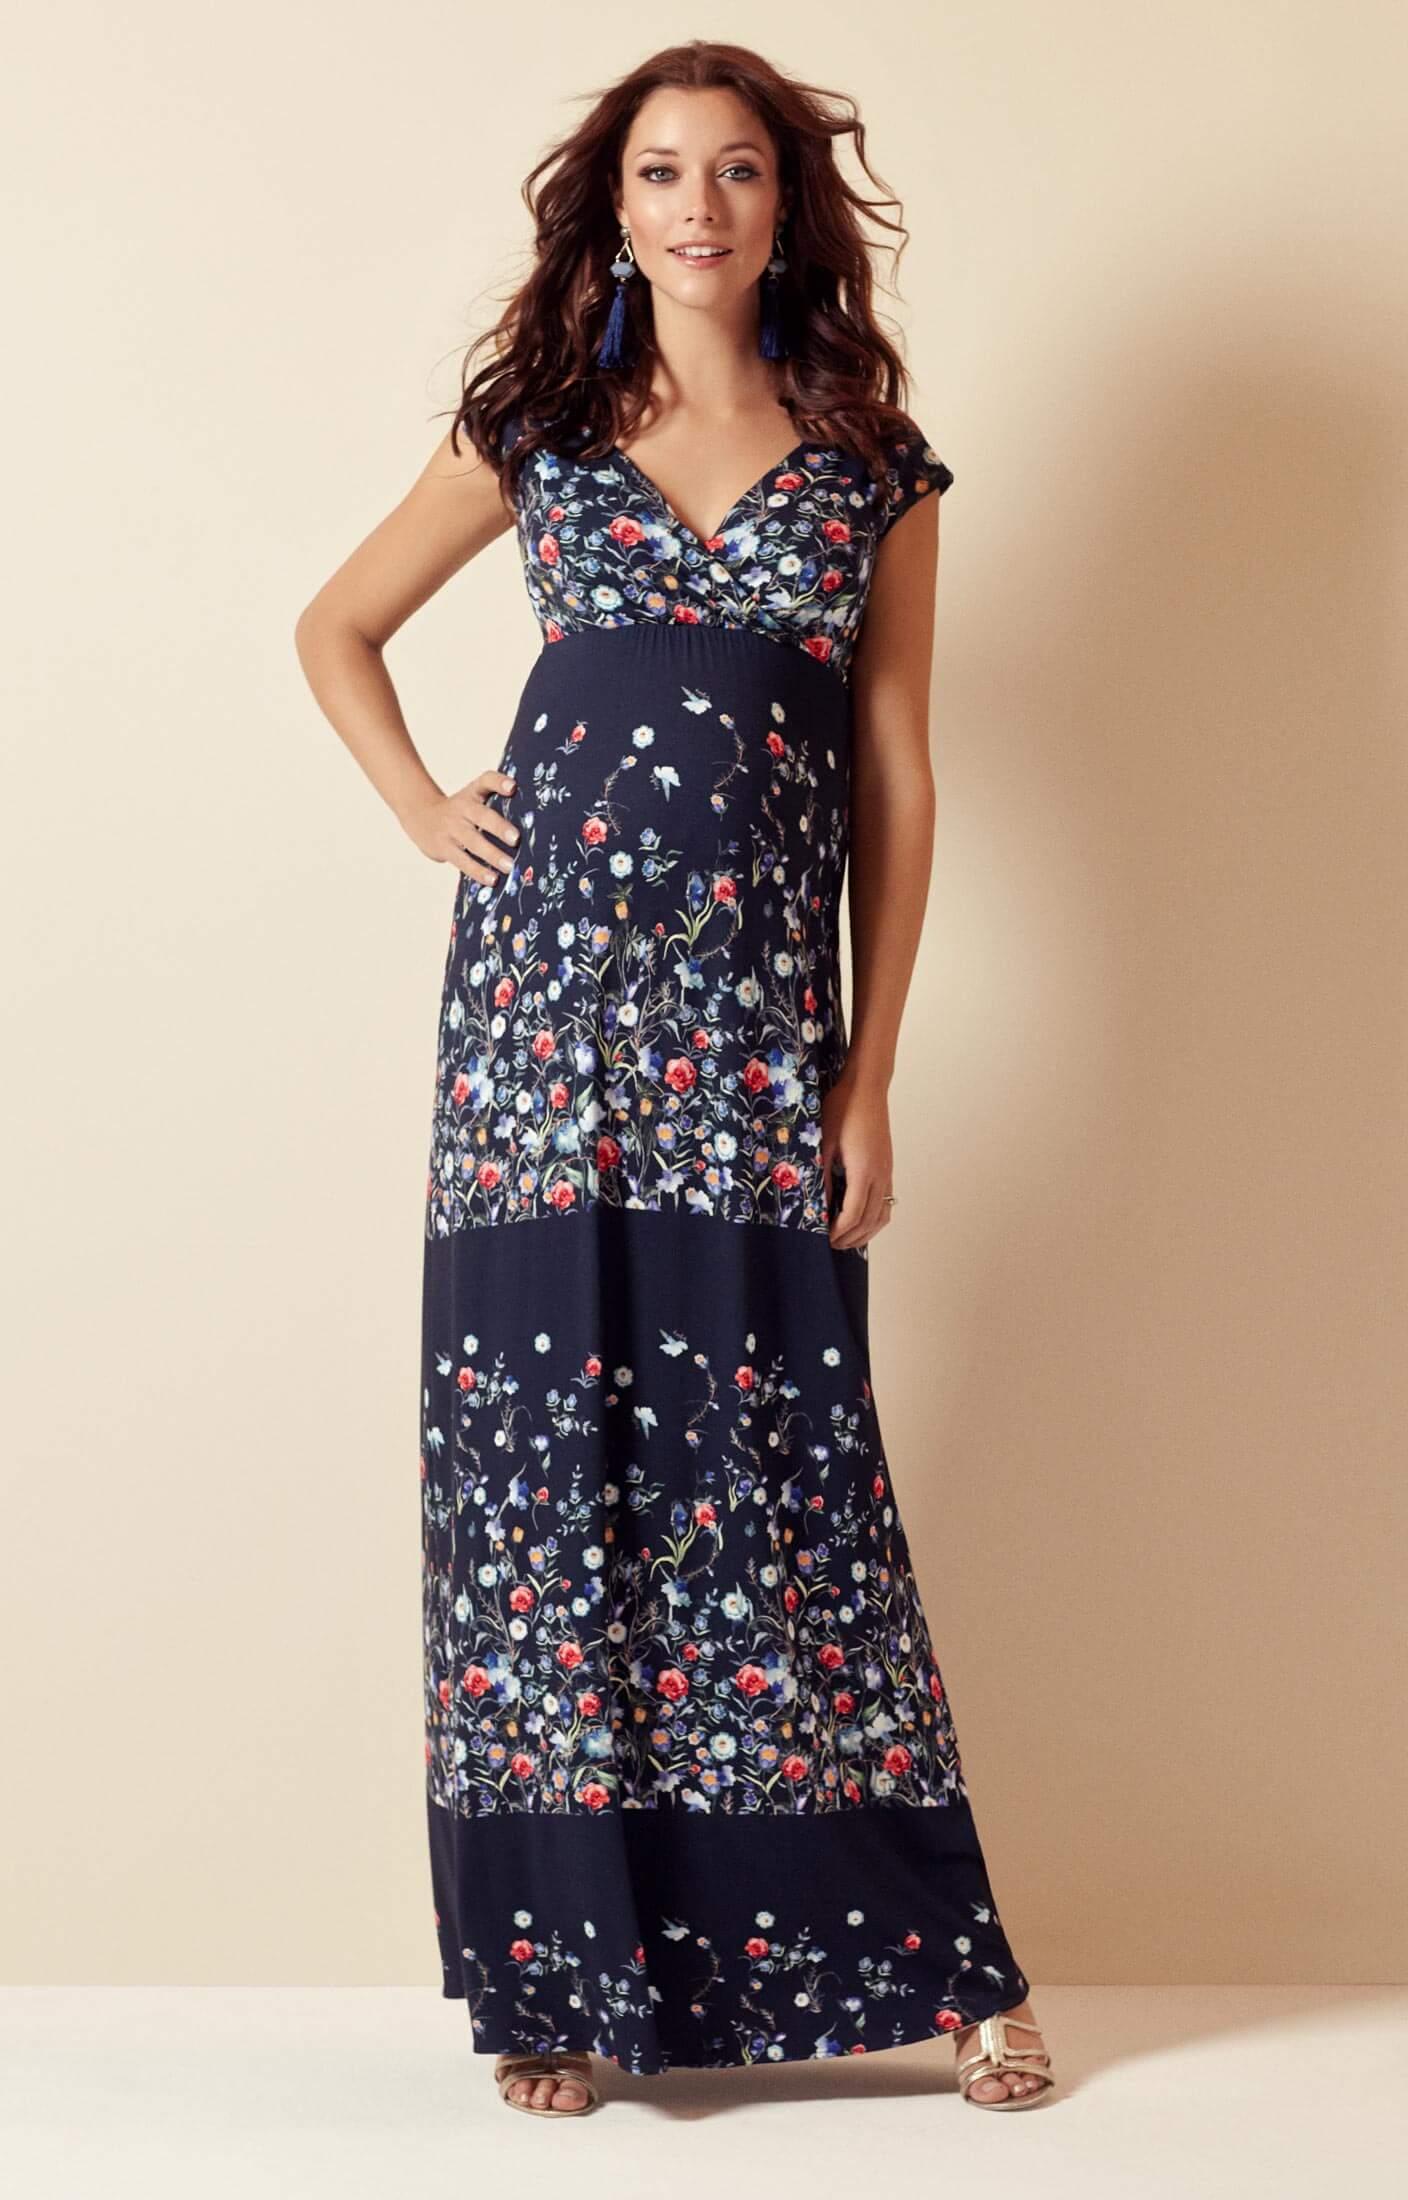 Boho Maxi Dress Maternity Cheap B30bc 71162